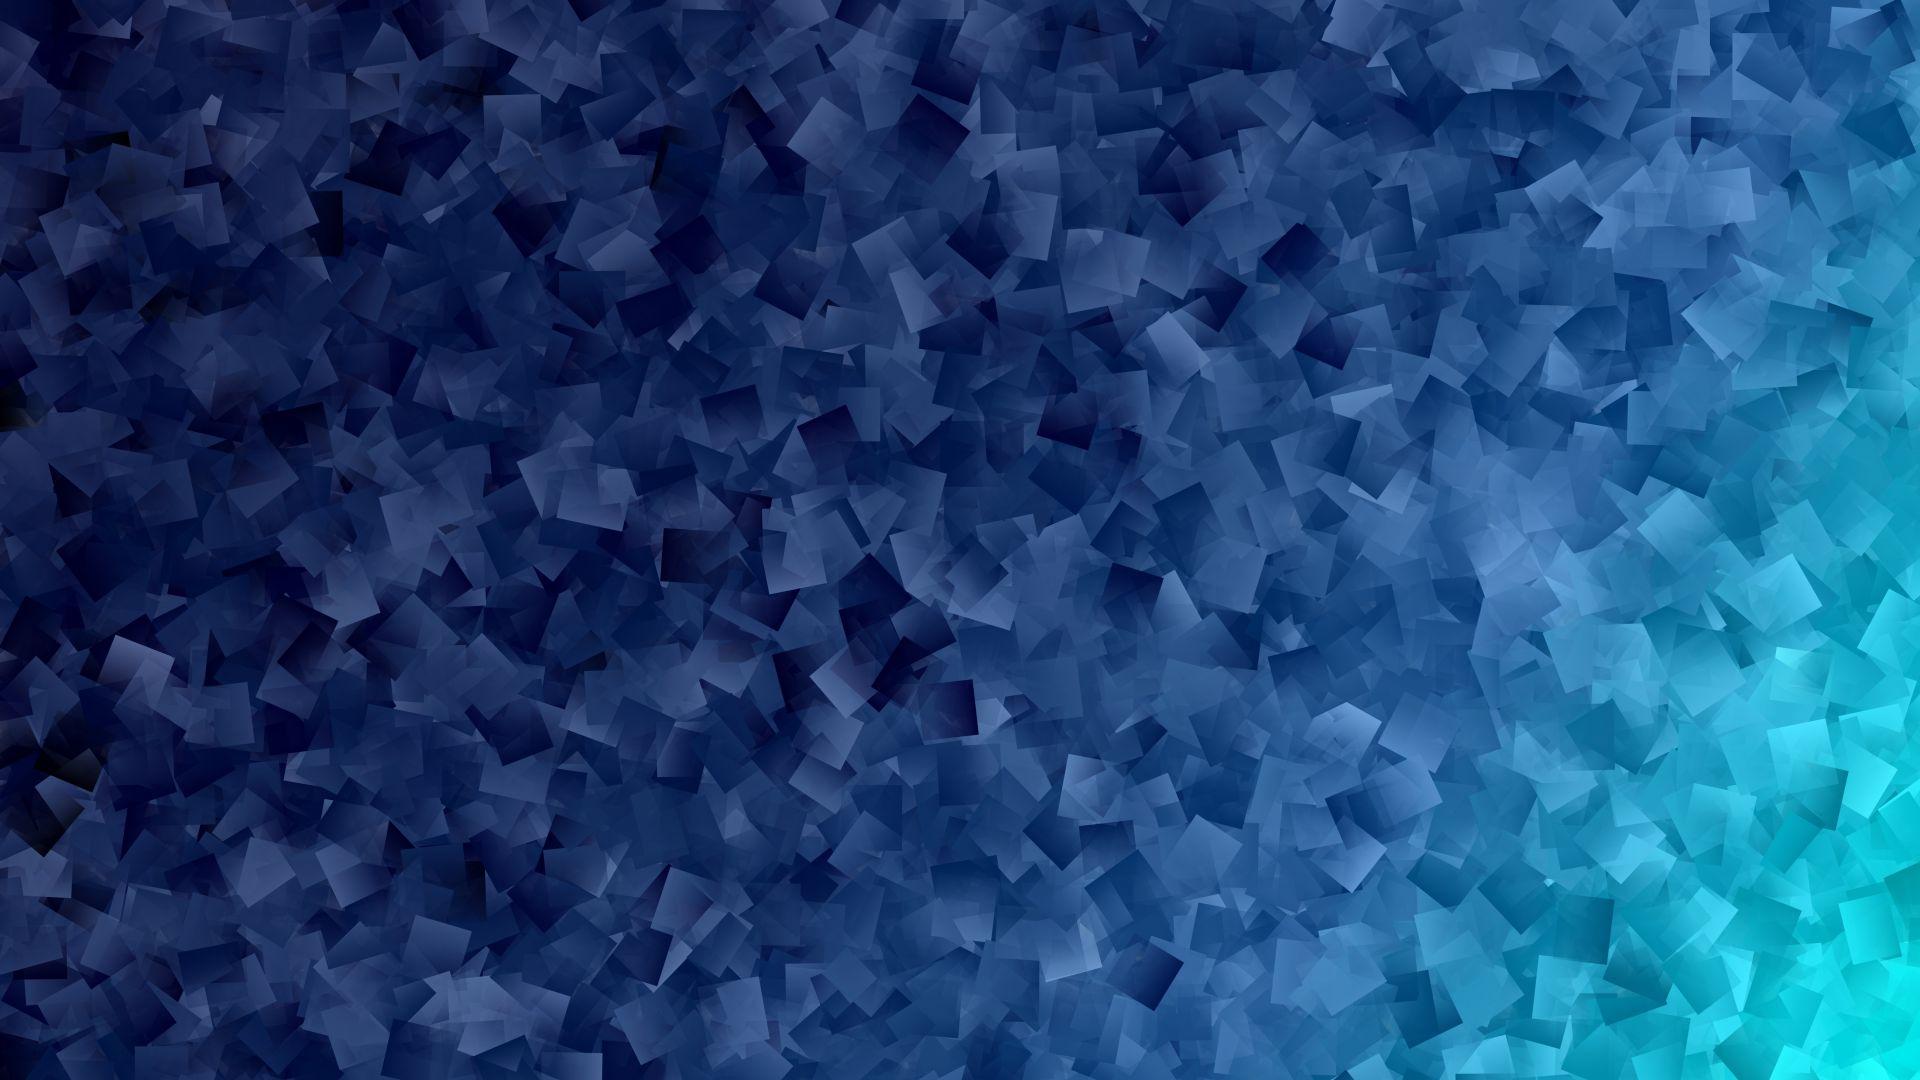 Desktop Wallpaper Abstract Blue Patterns Design Hd Image Picture Background 3u9vdp